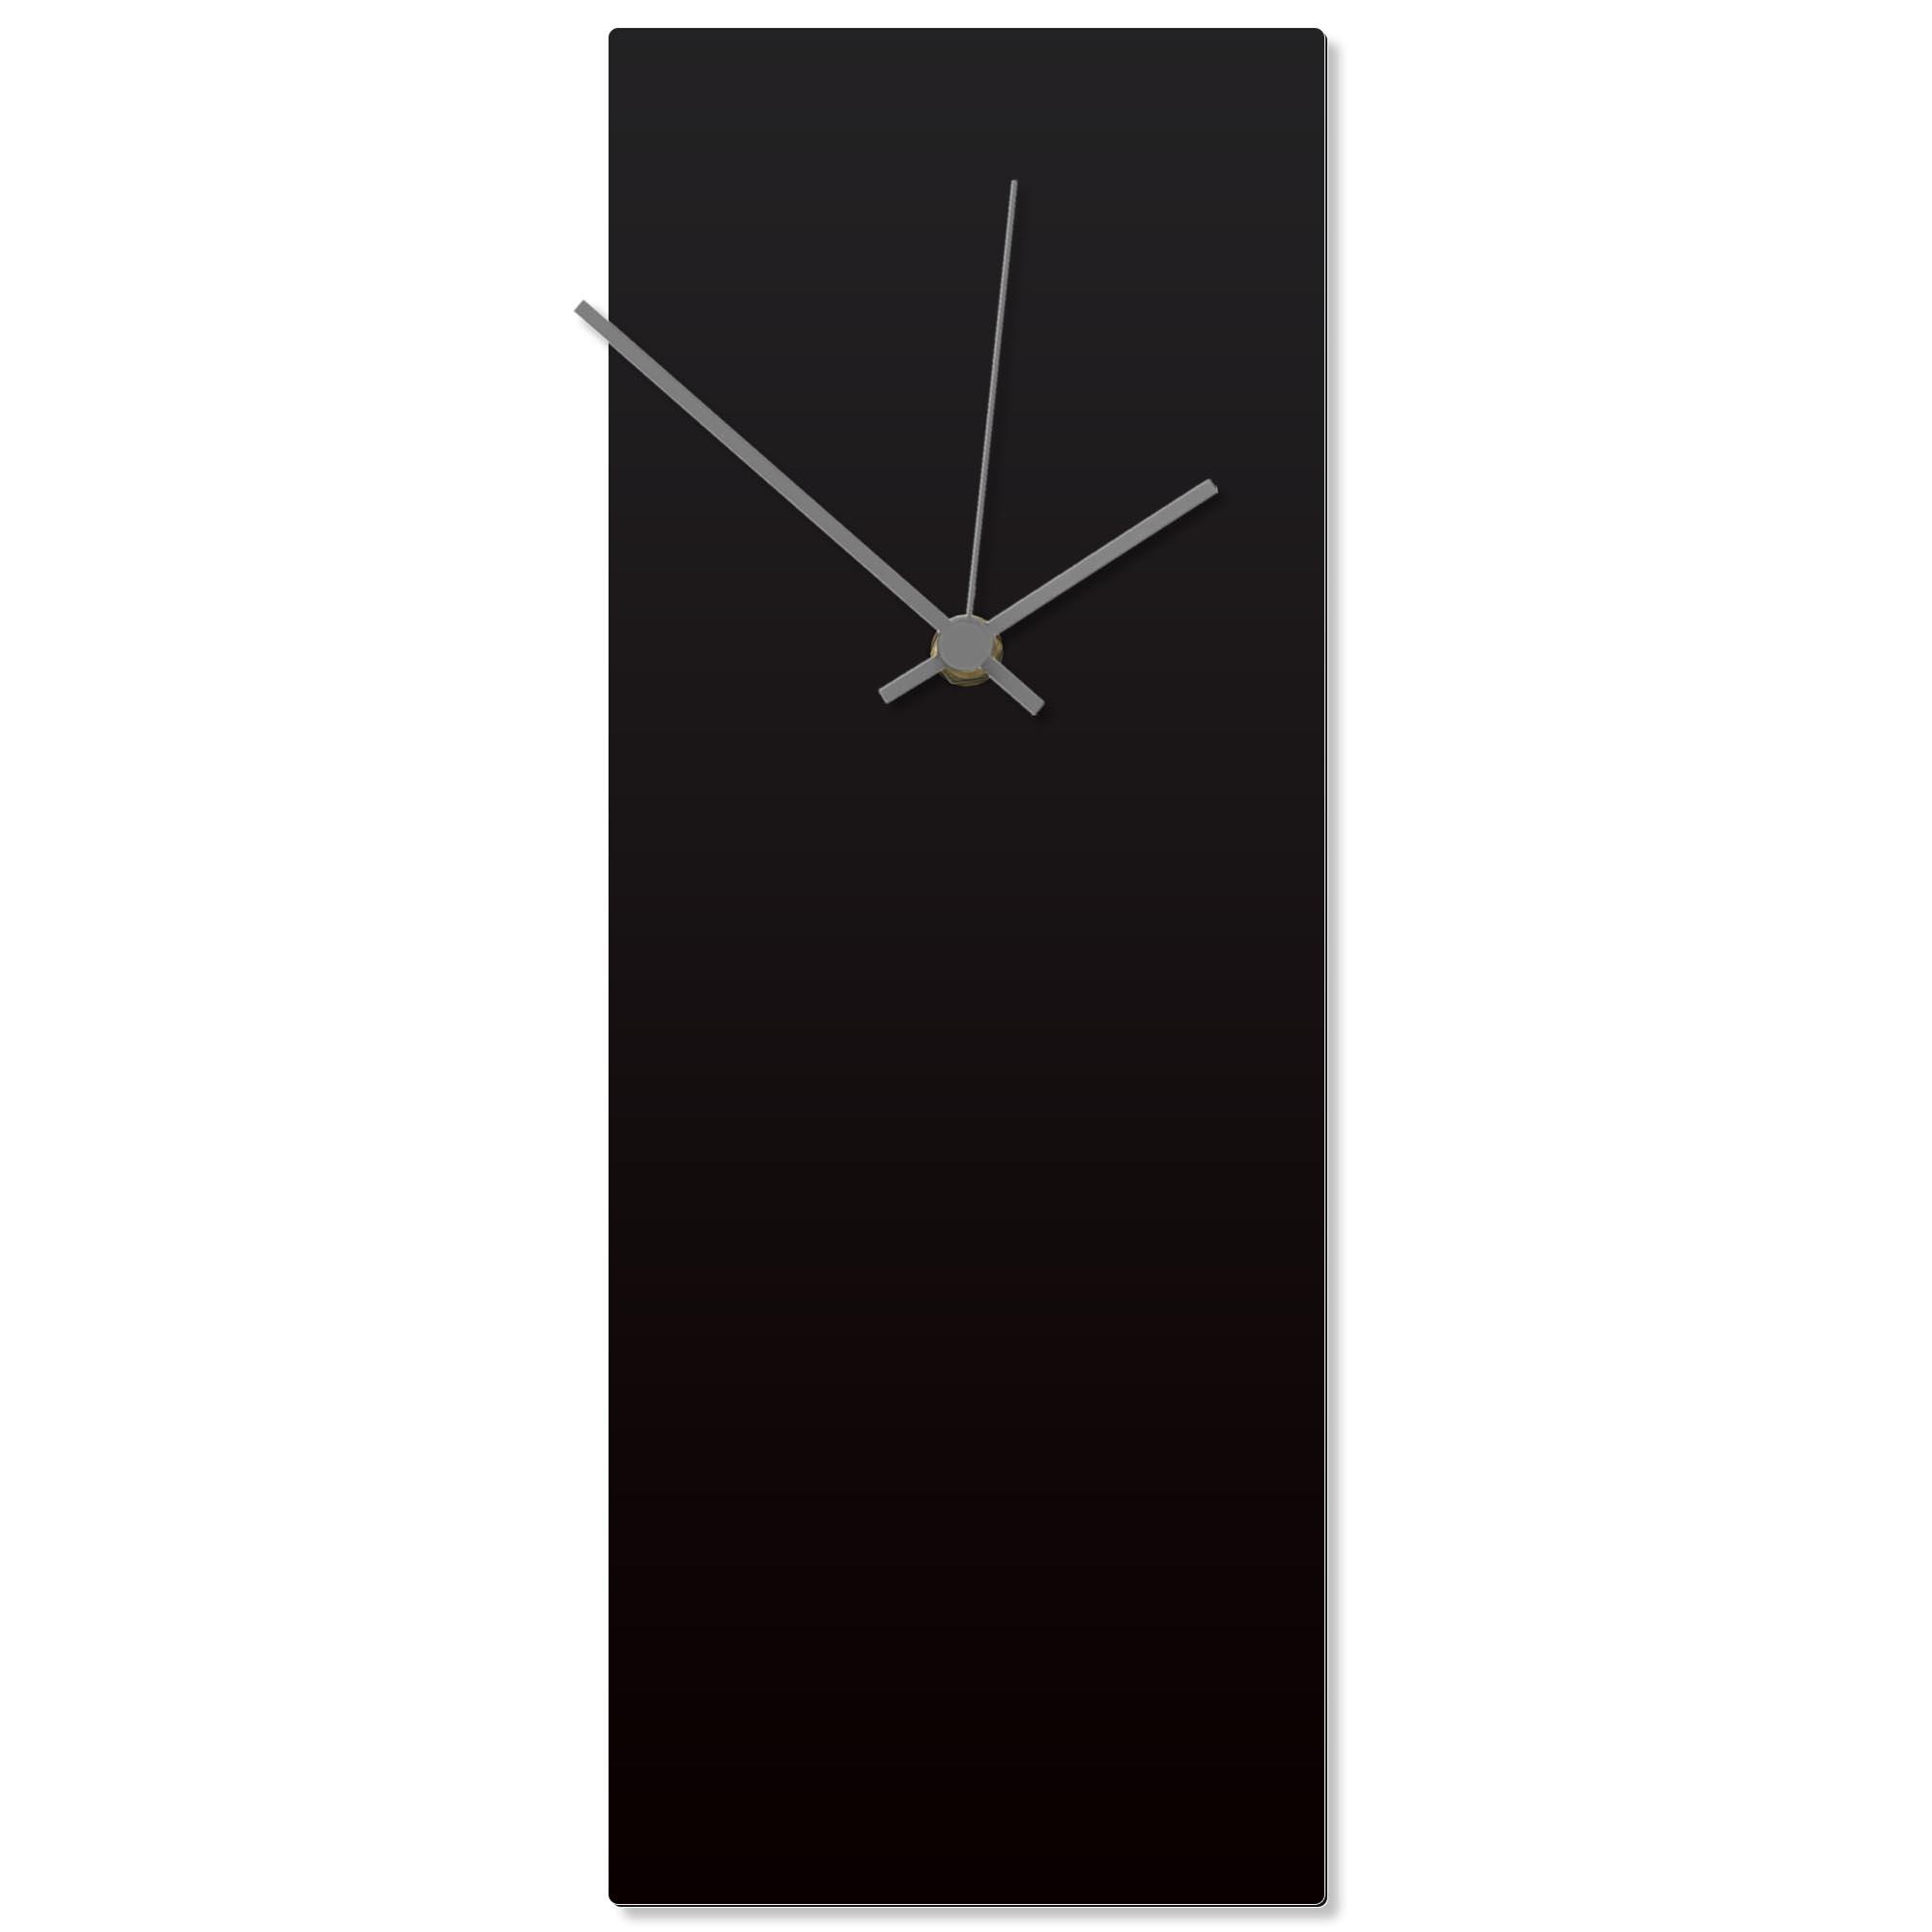 Blackout Grey Clock 6x16in. Aluminum Polymetal